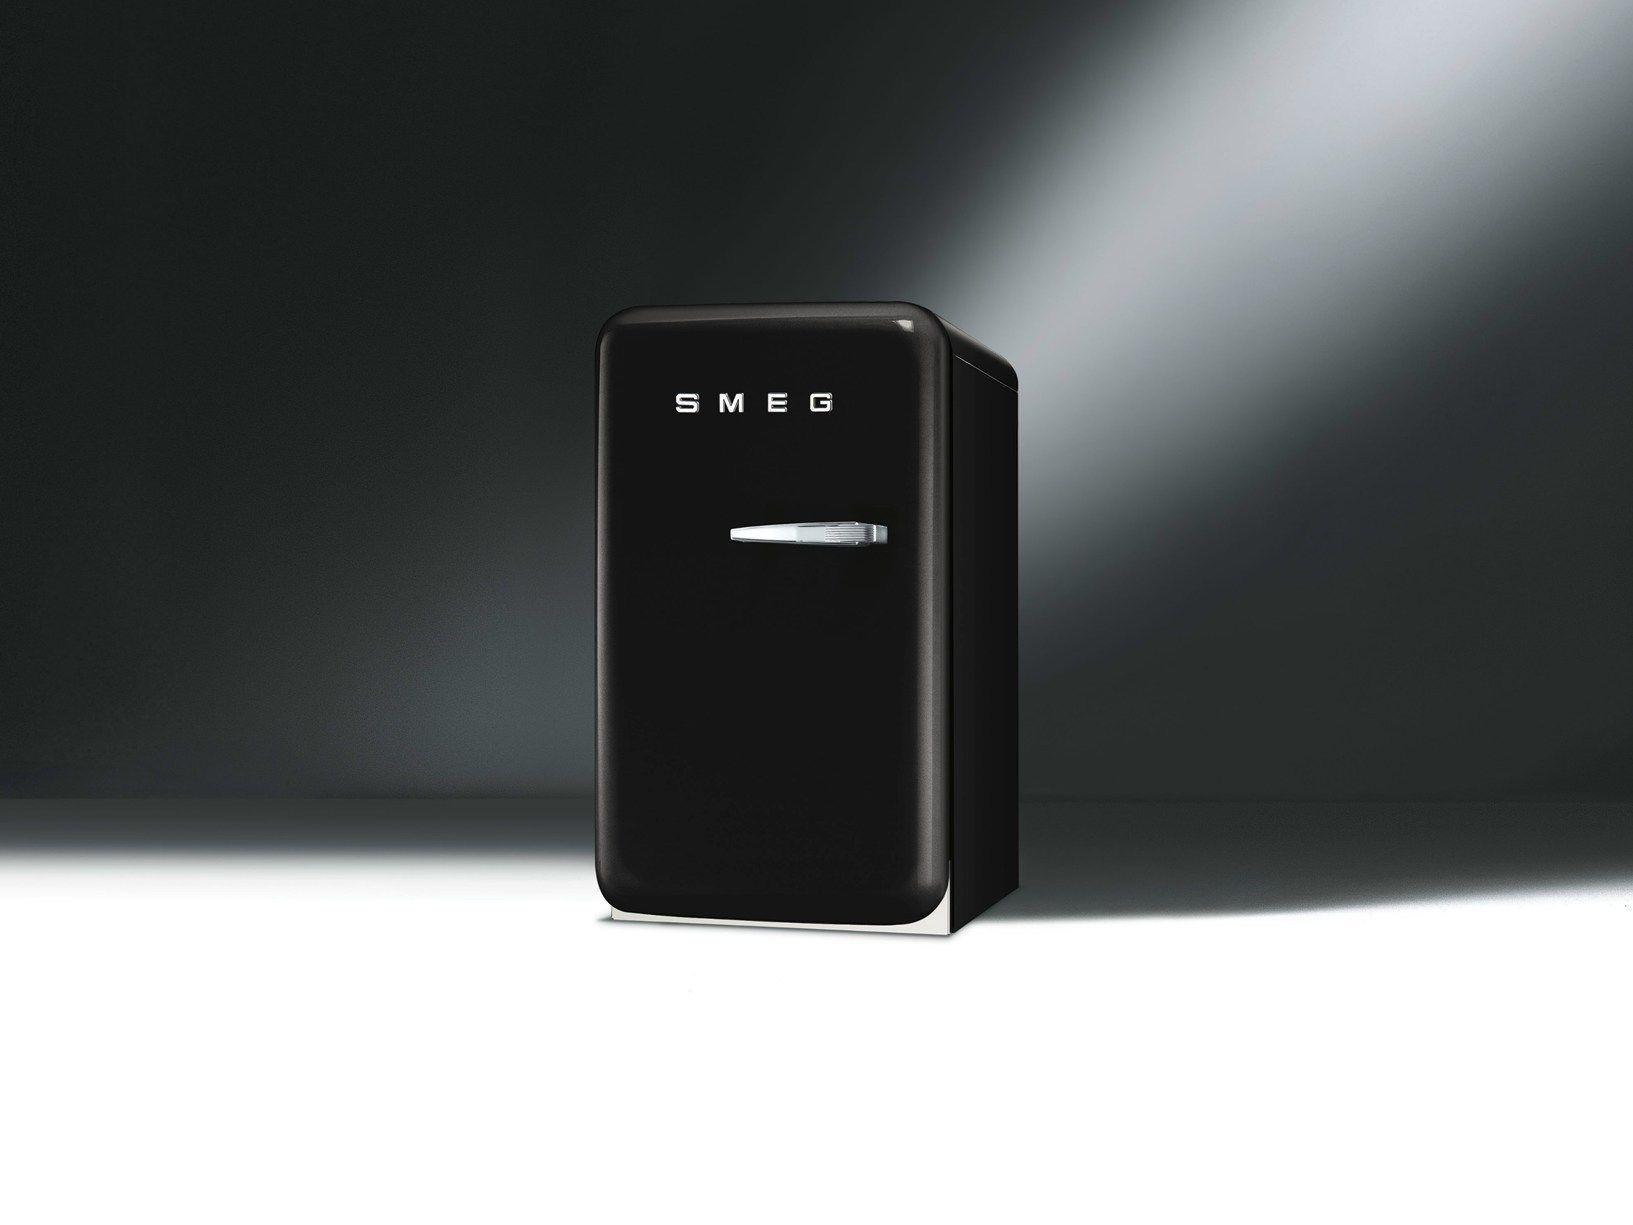 Smeg presenta il nuovo mini-frigo FAB5